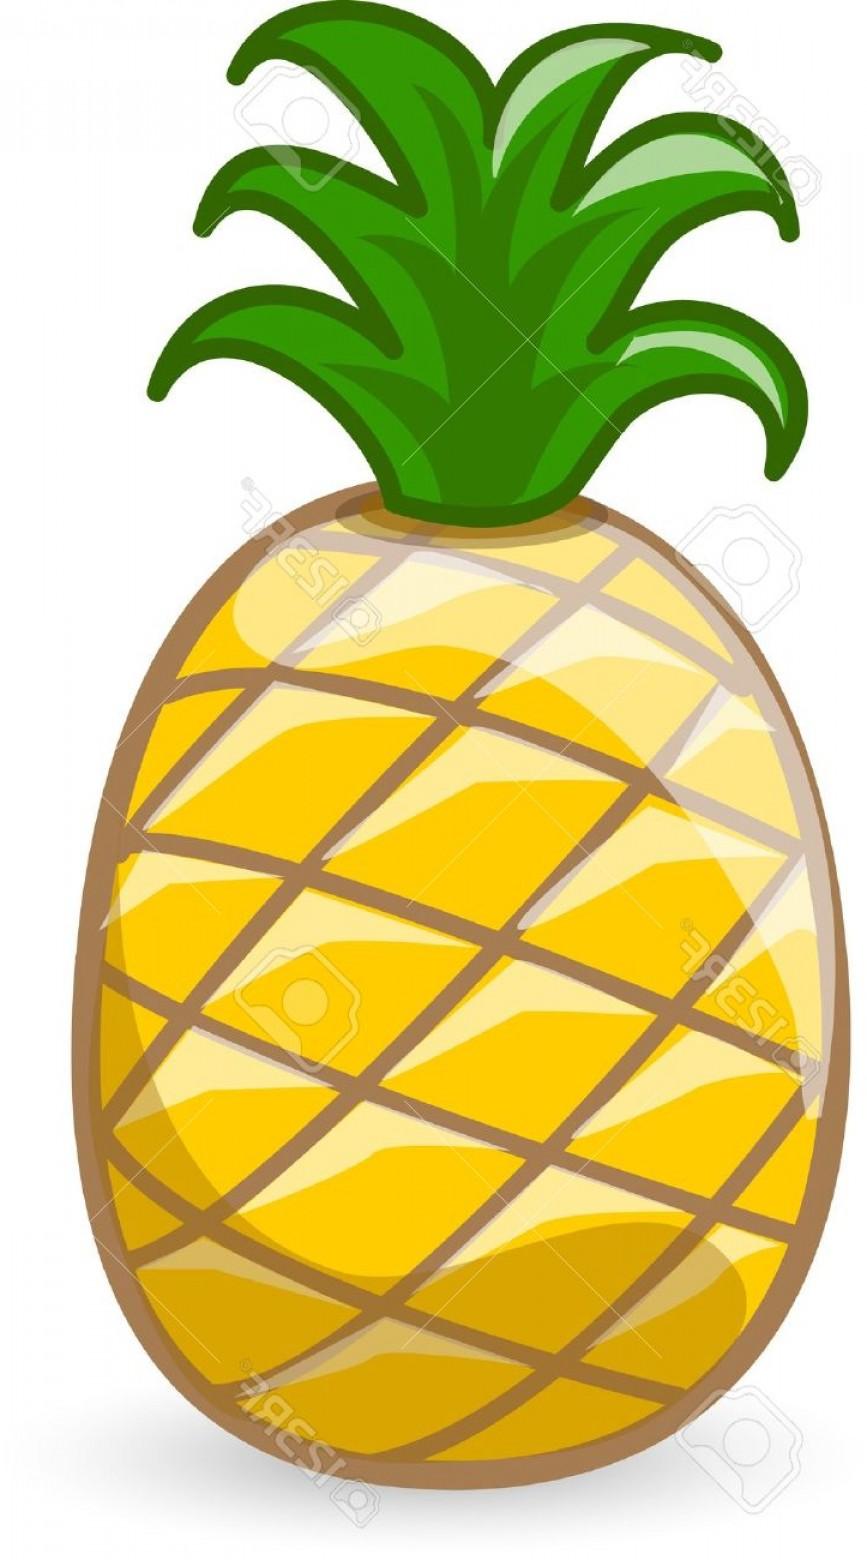 867x1560 File Cartoon Pineapple Stock Vector Fruit Shopatcloth